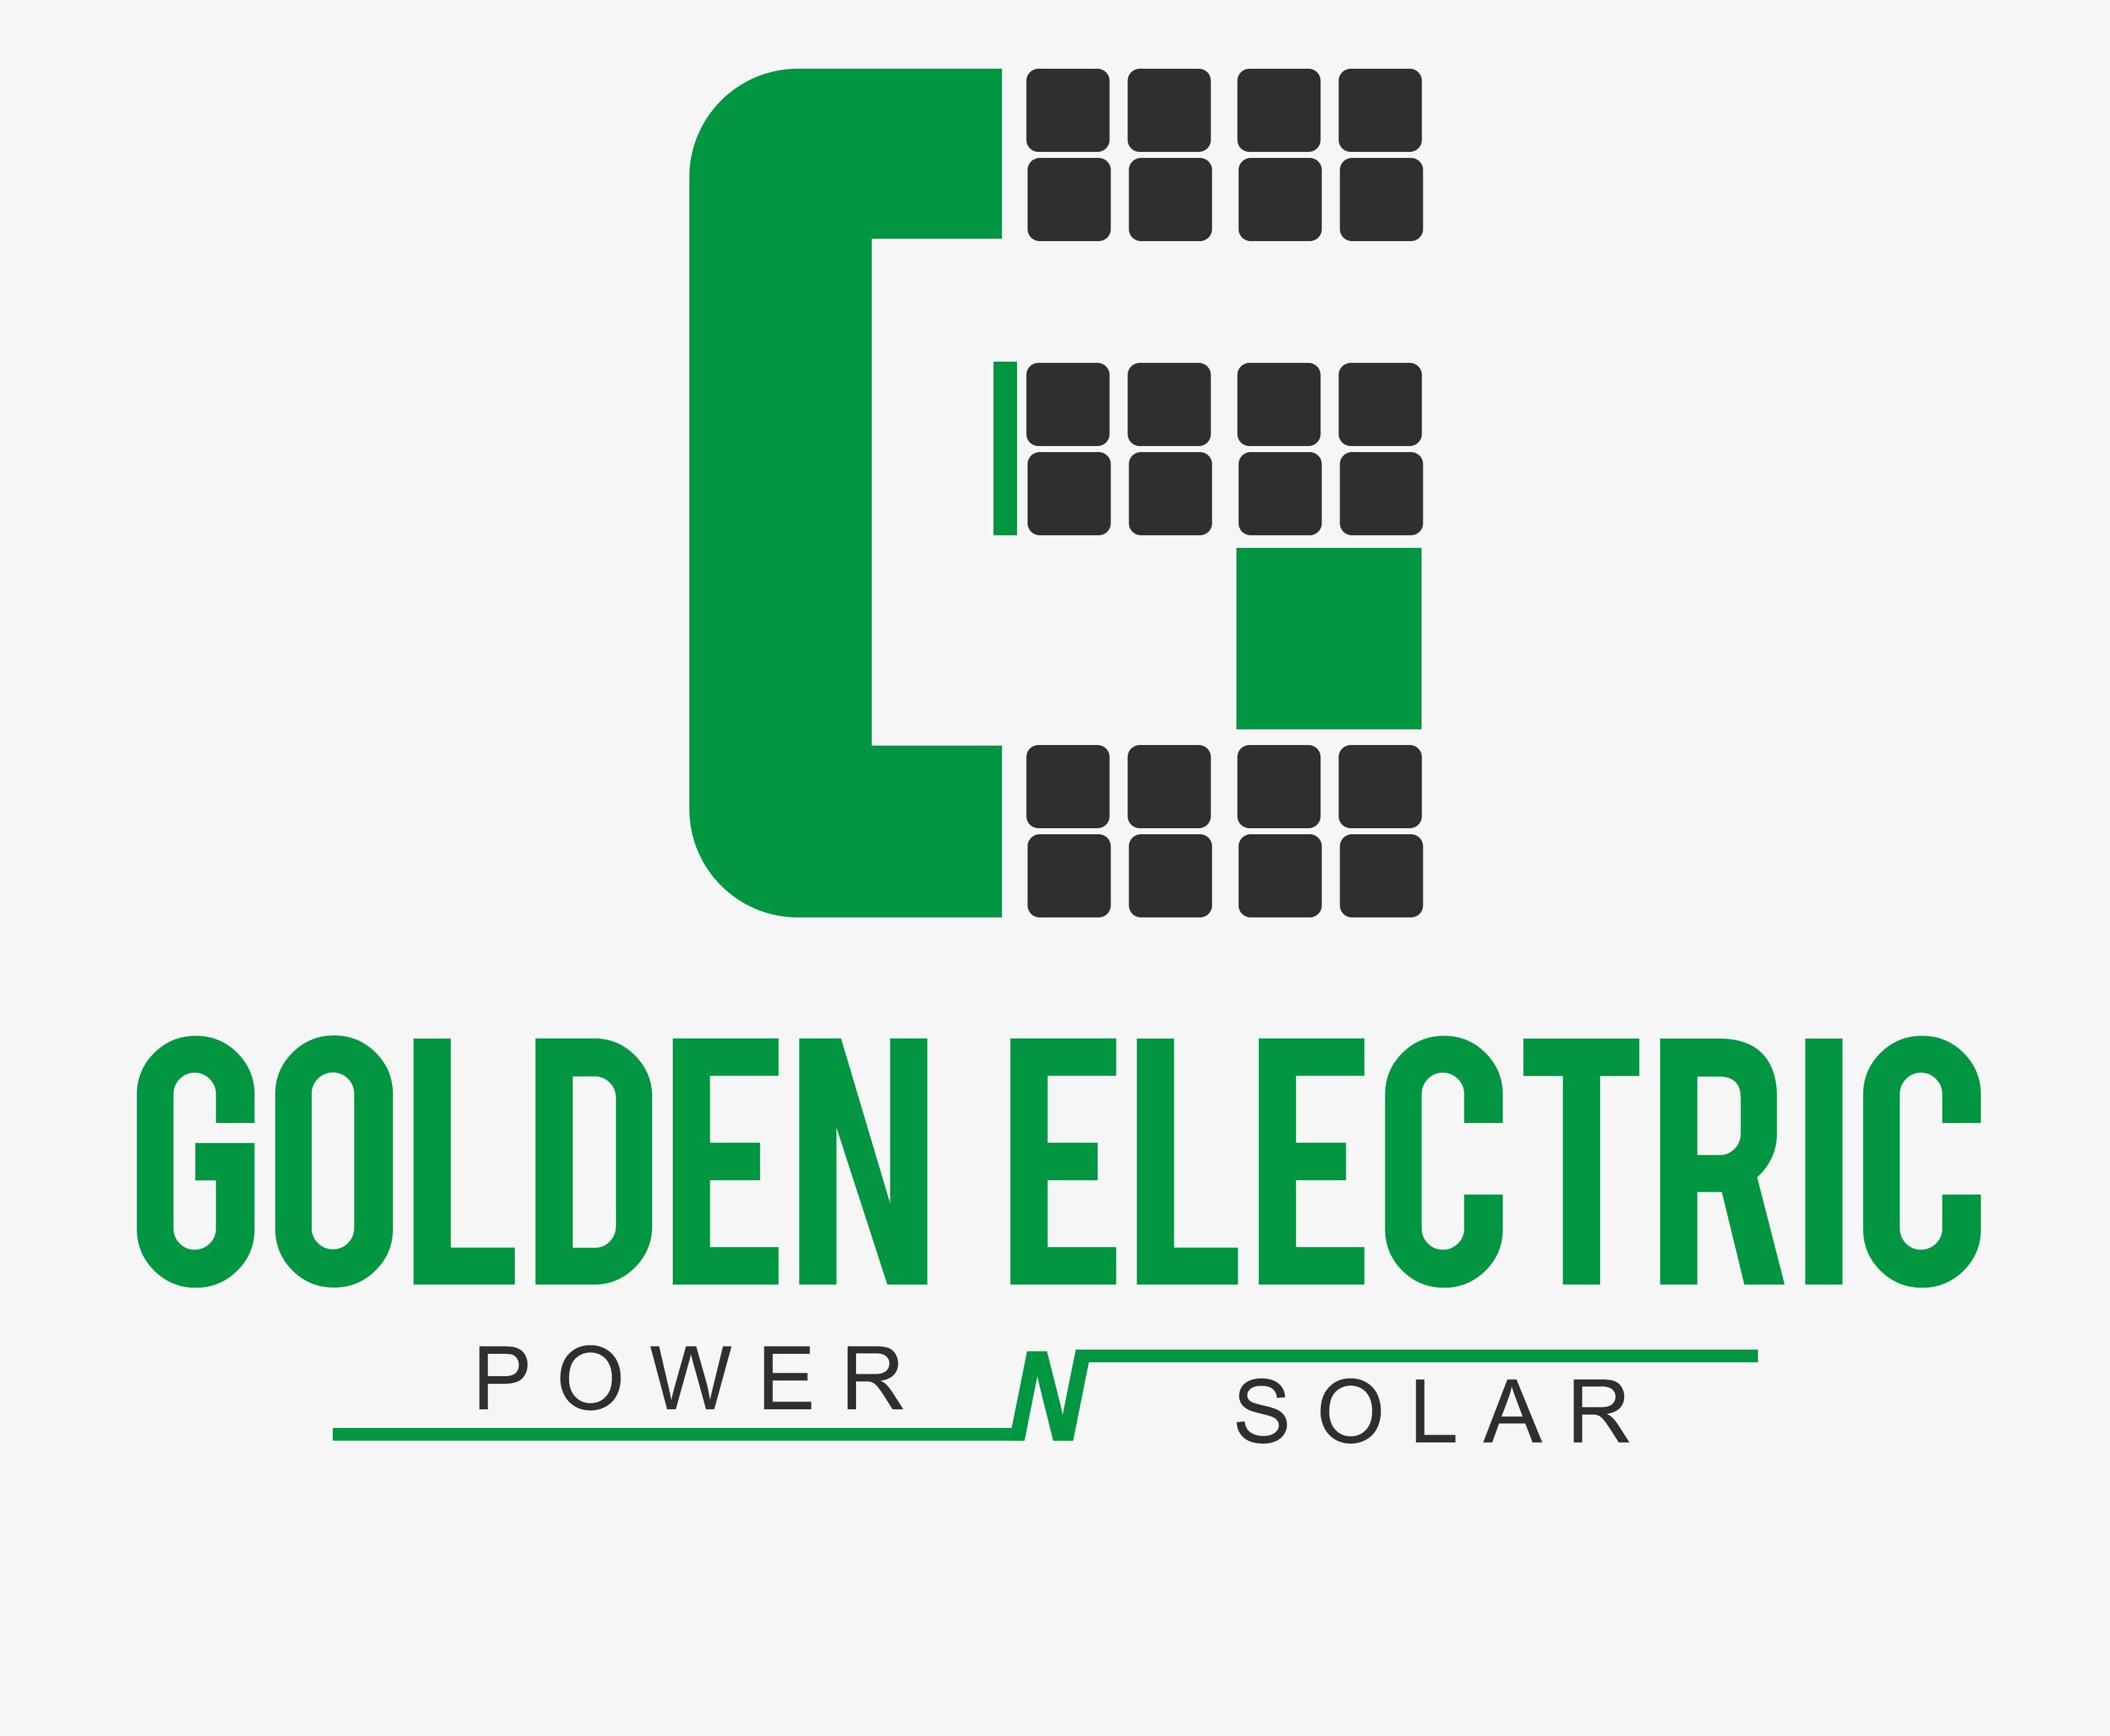 Golden Electric Power N Solar